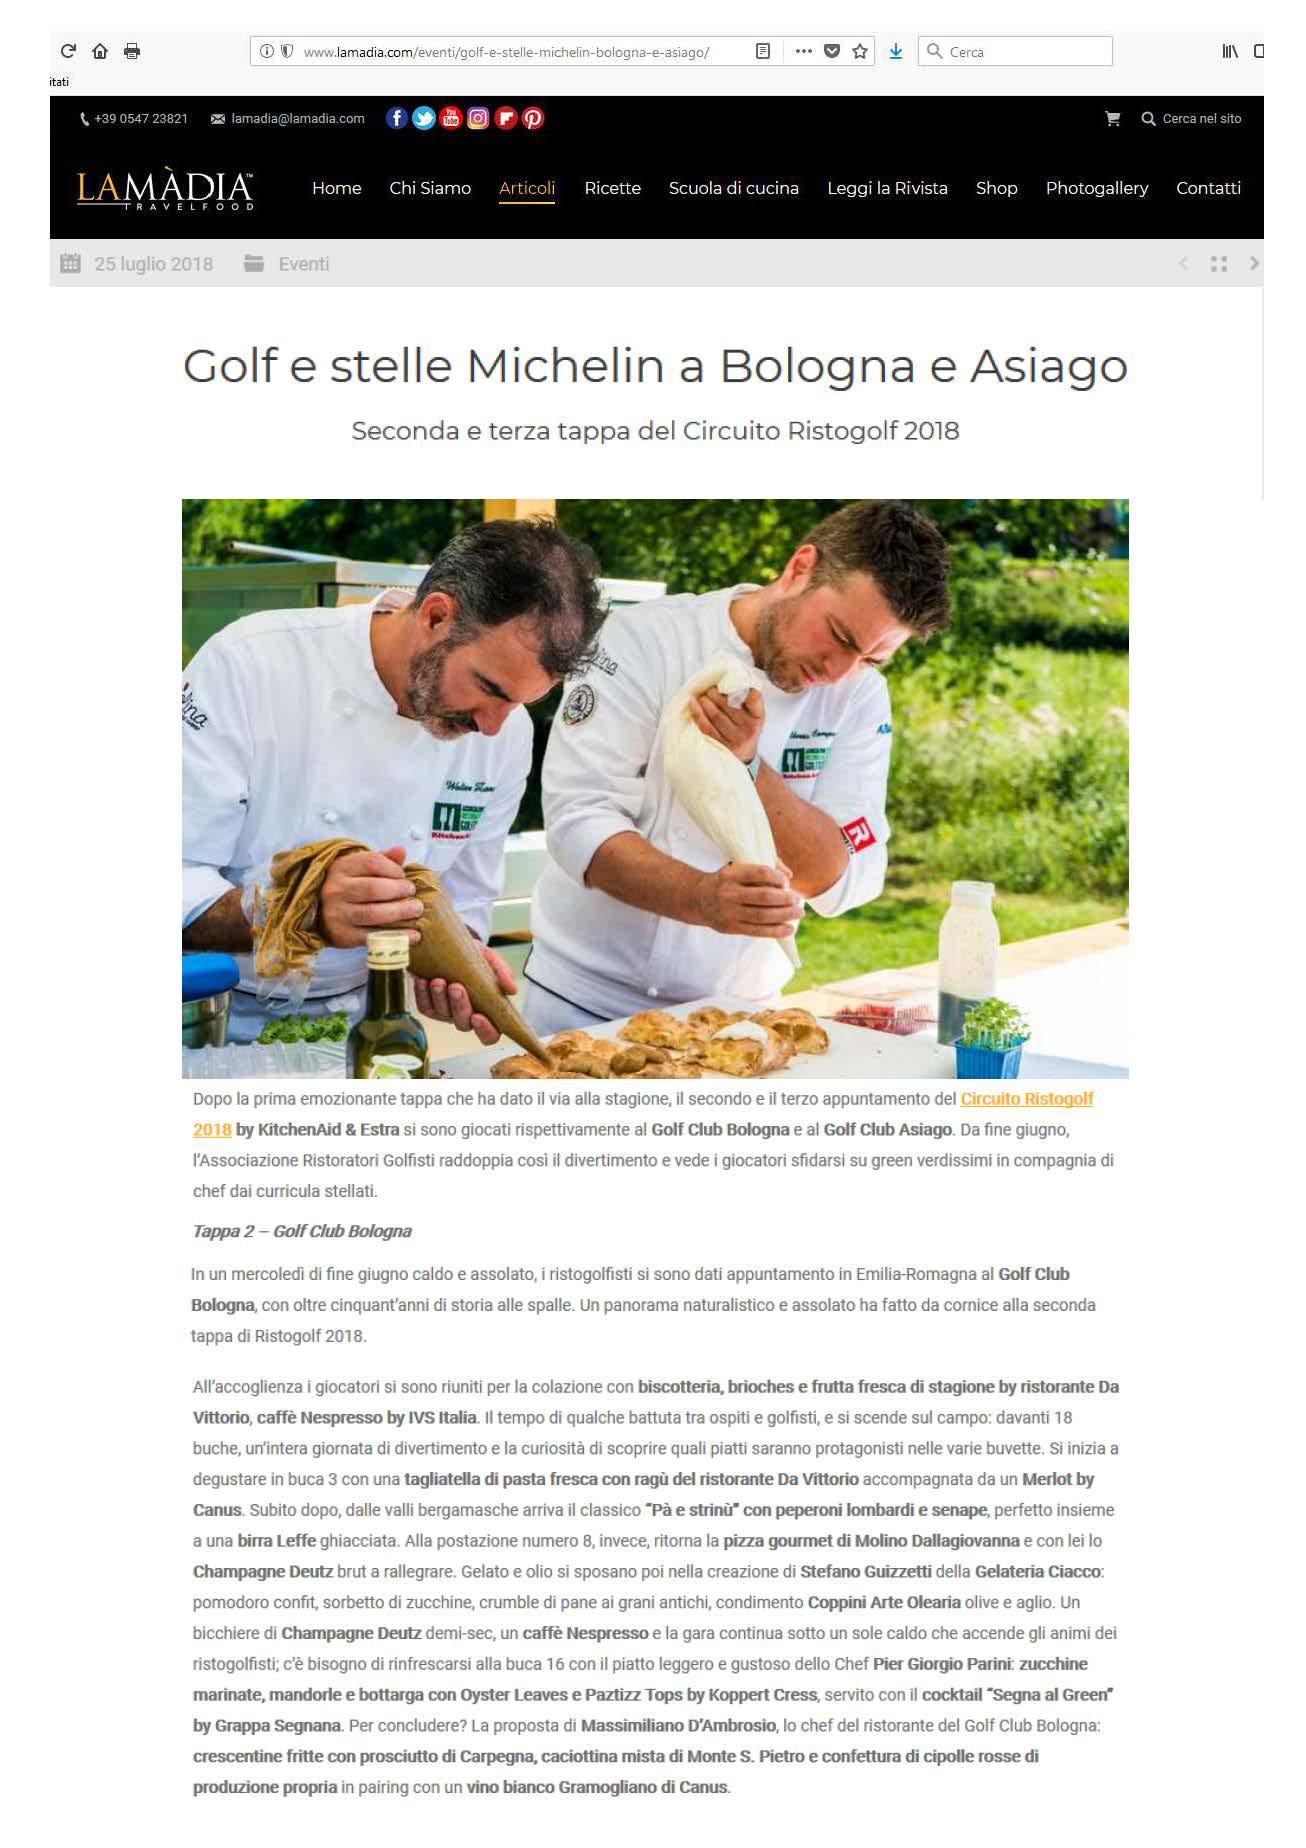 2018.07.25 La Madia web_Page_1